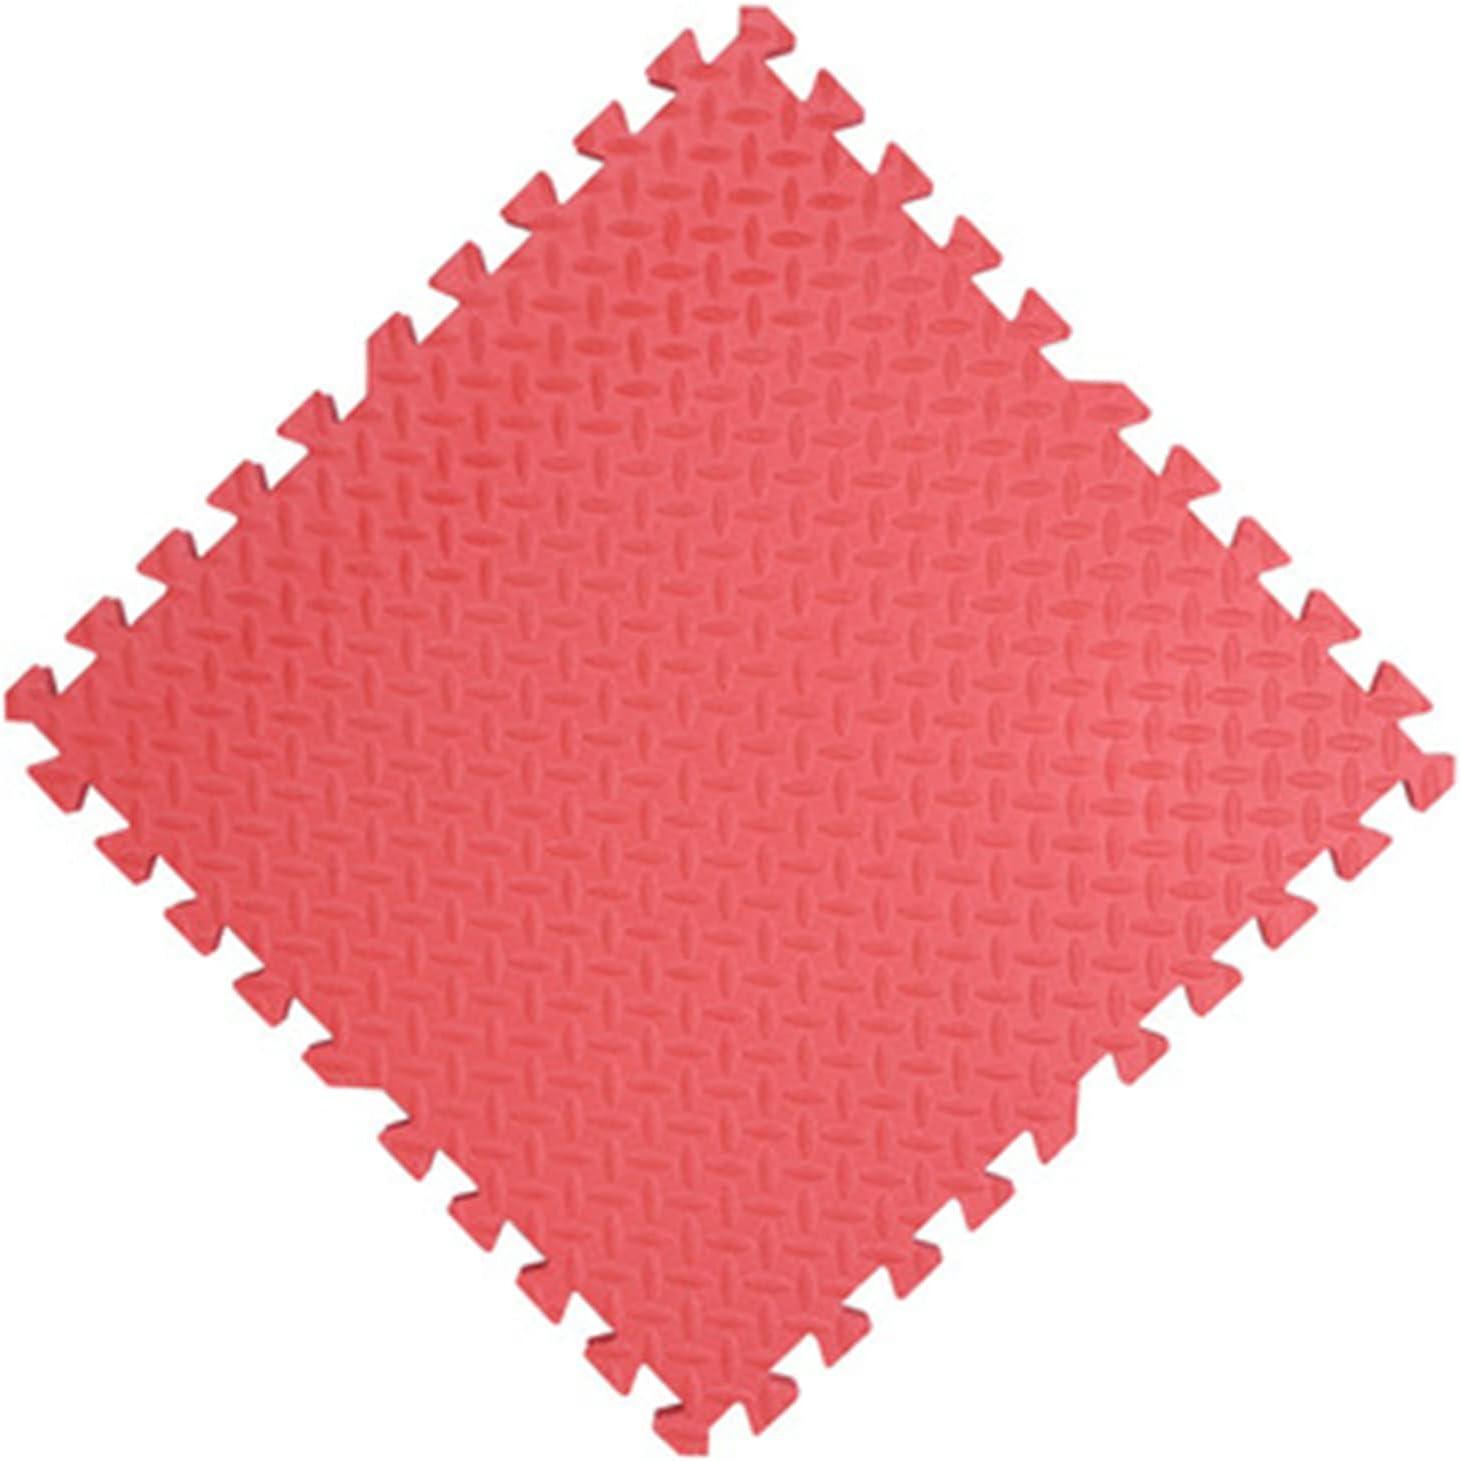 Termino Foam Attention brand Mats Interlocking Puzzle Prote Mat Child Beauty products EVA Tiles